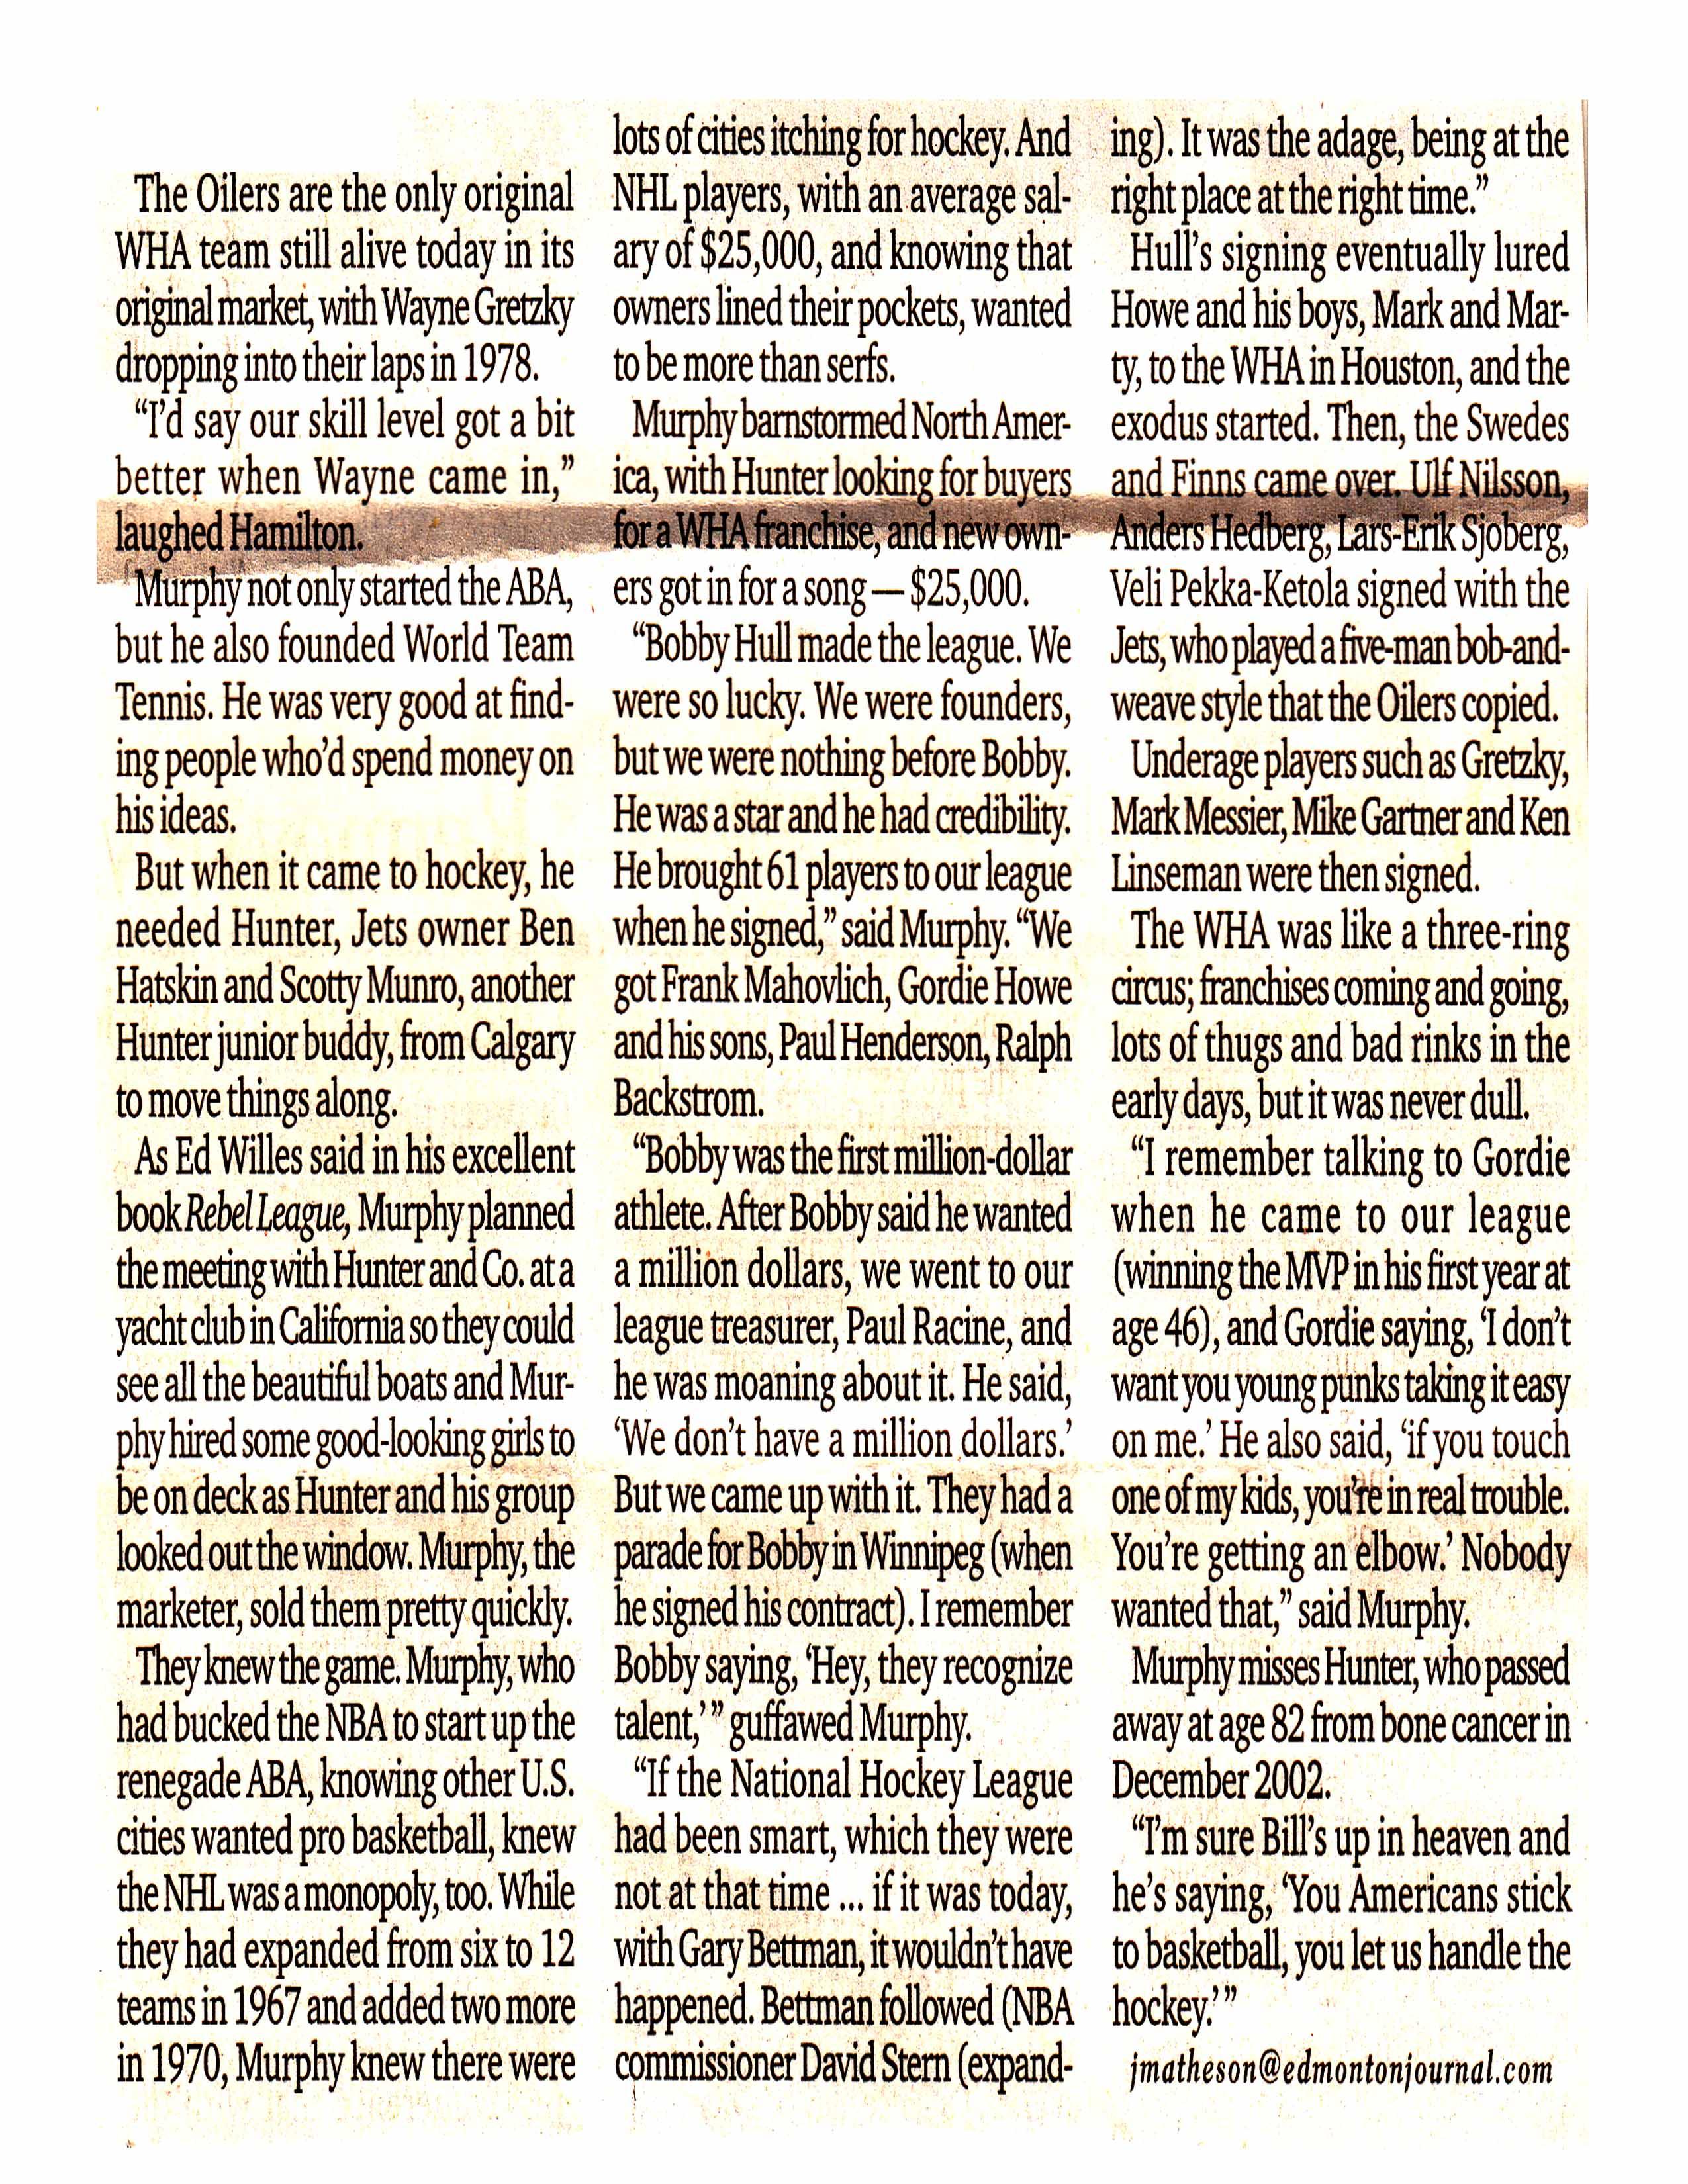 Edmonton Journal article - Page 2